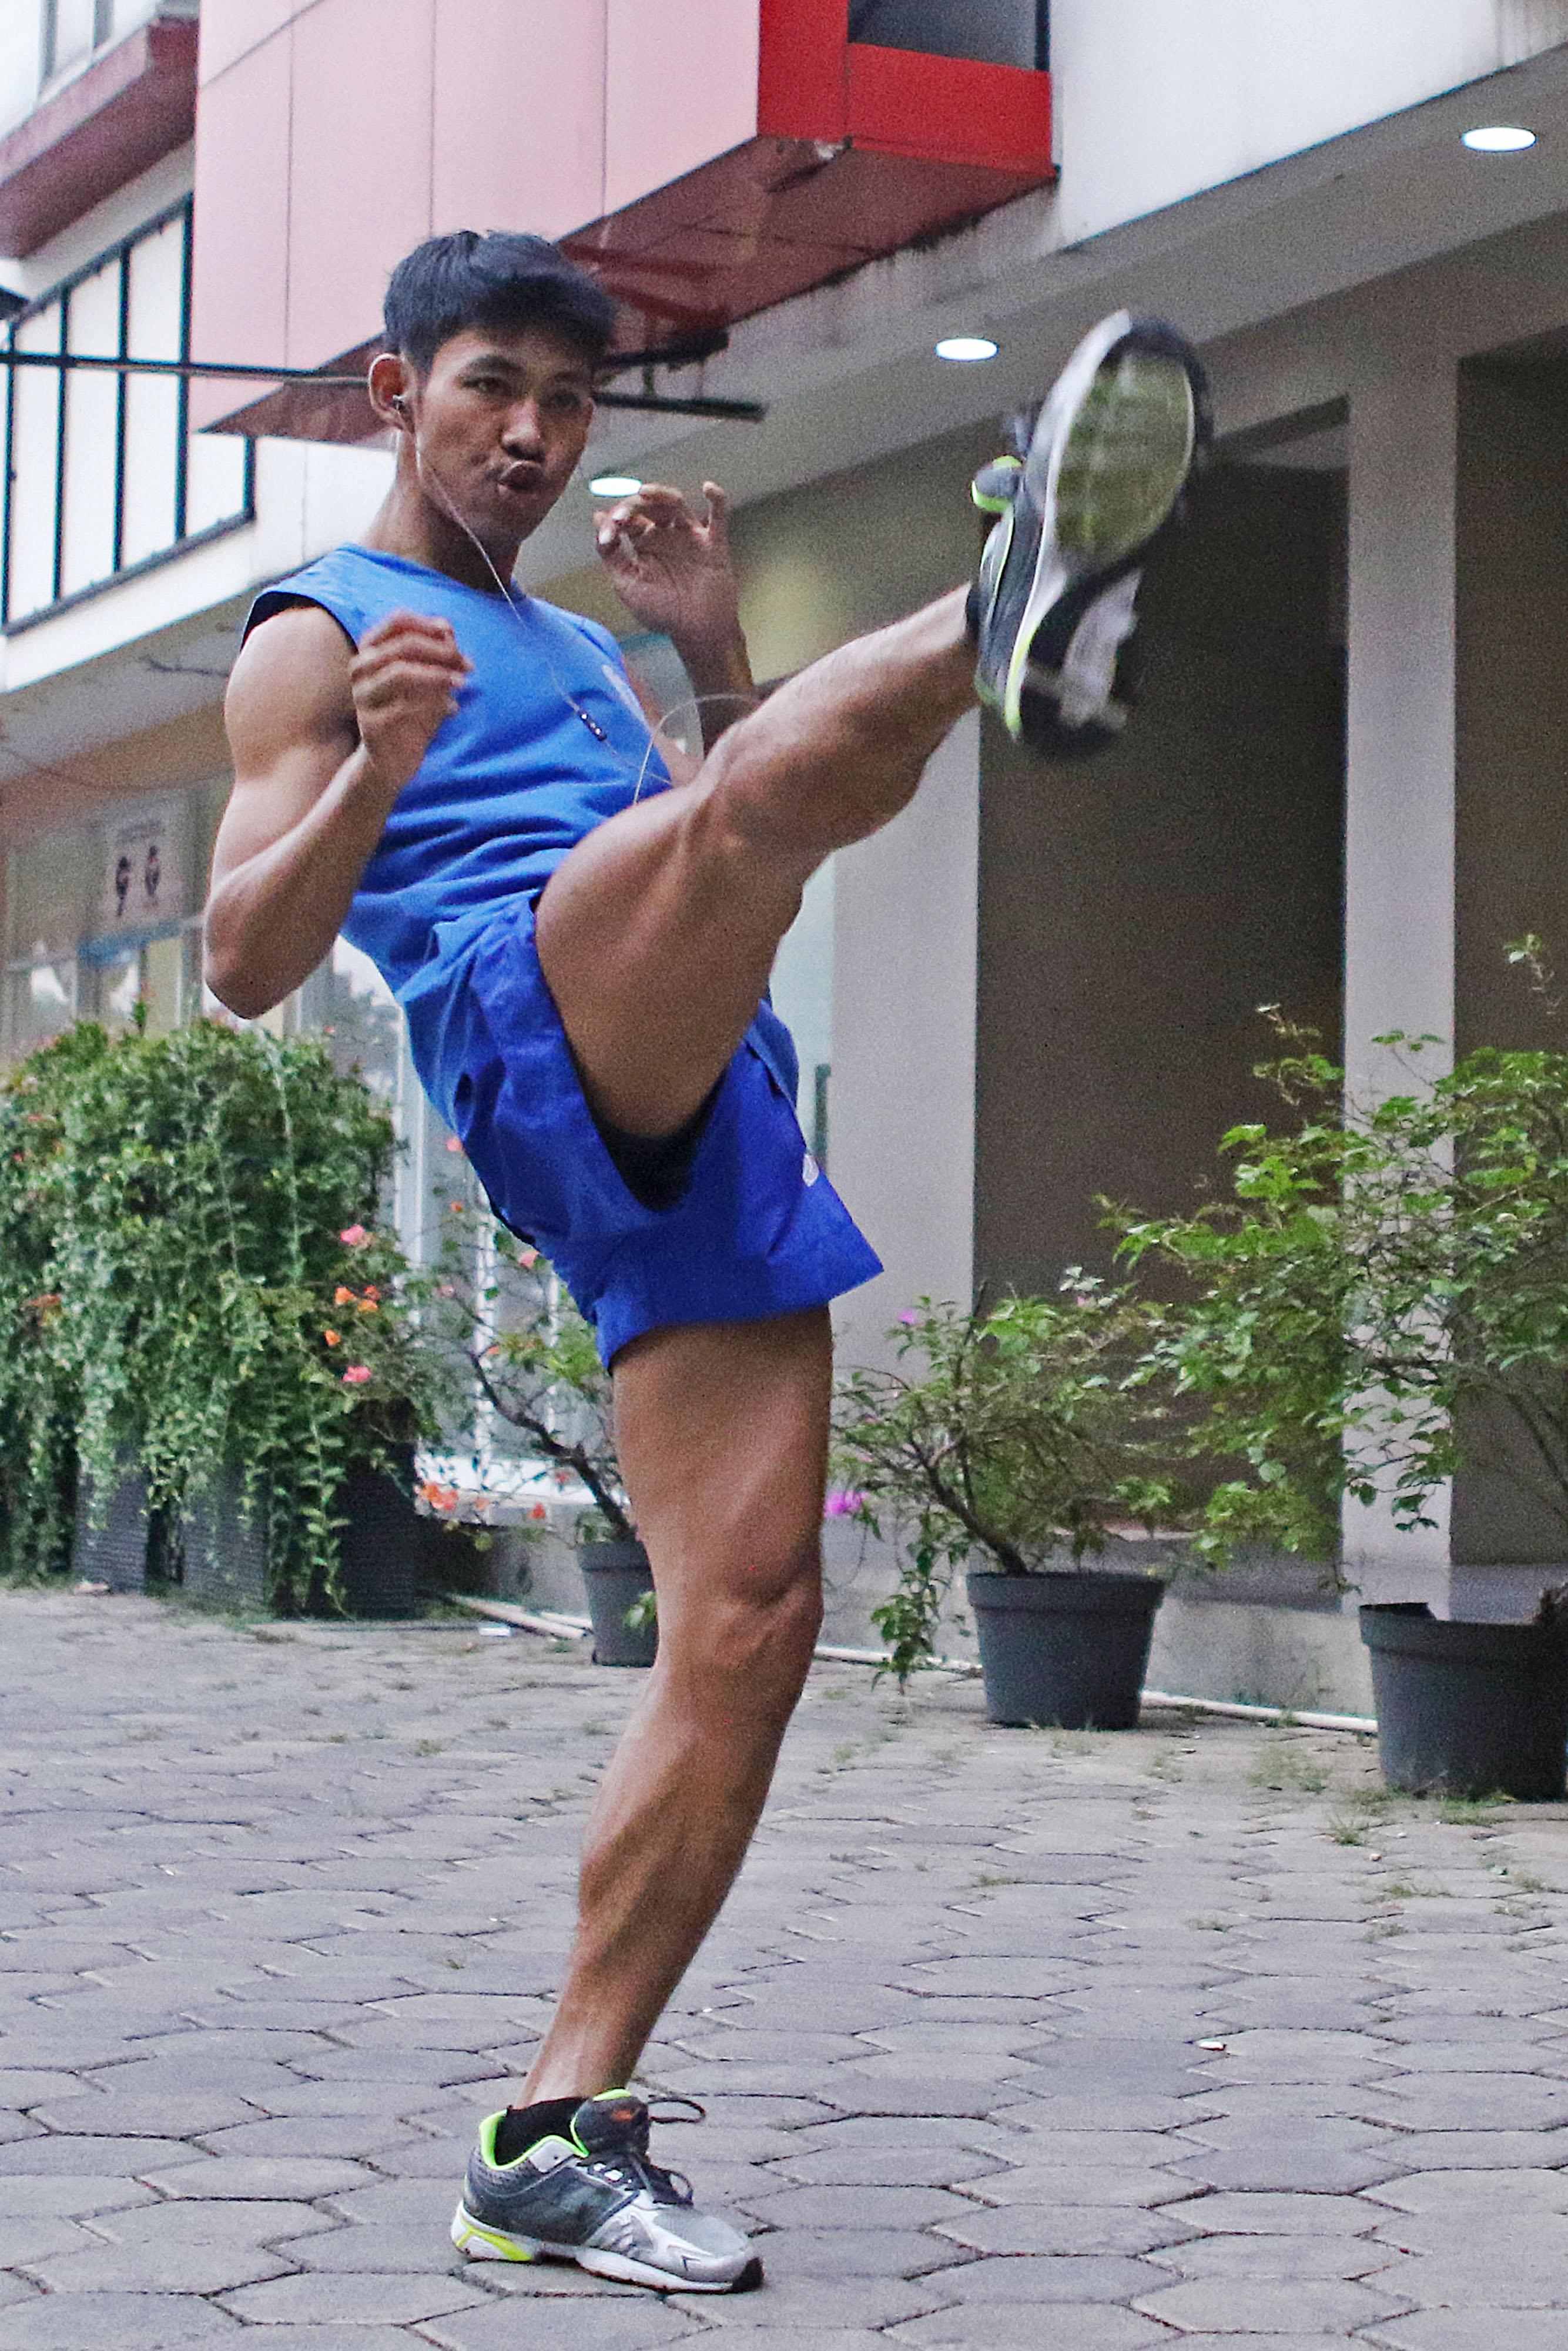 Atlet Muay Thai Kota Depok, Rian Rinaldy sedang berlatih di depan penginapan. Rian akan bertanding pada nomor 67 Kg pada Jum'at (12/10) di GOR Laga Satria Pakansari, Bogor. KONI KOTA DEPOK/Faruqi/2018